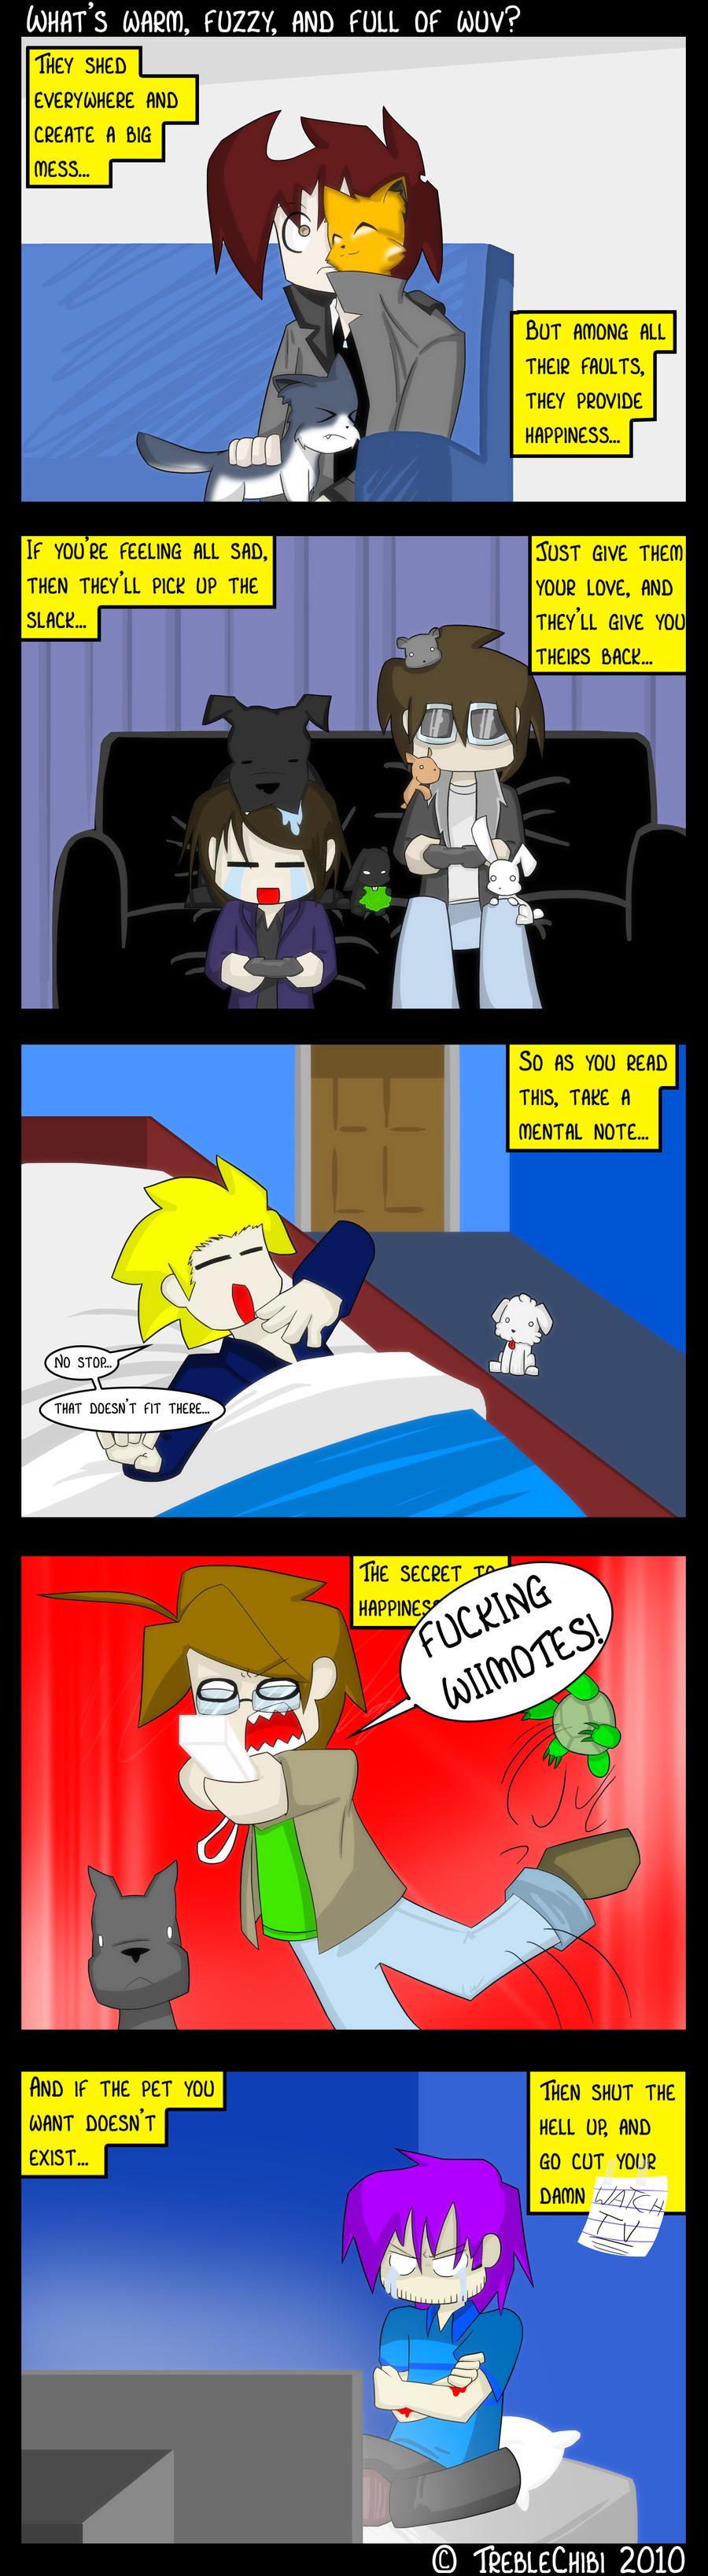 Comic Book Book 9 by DukeStewart